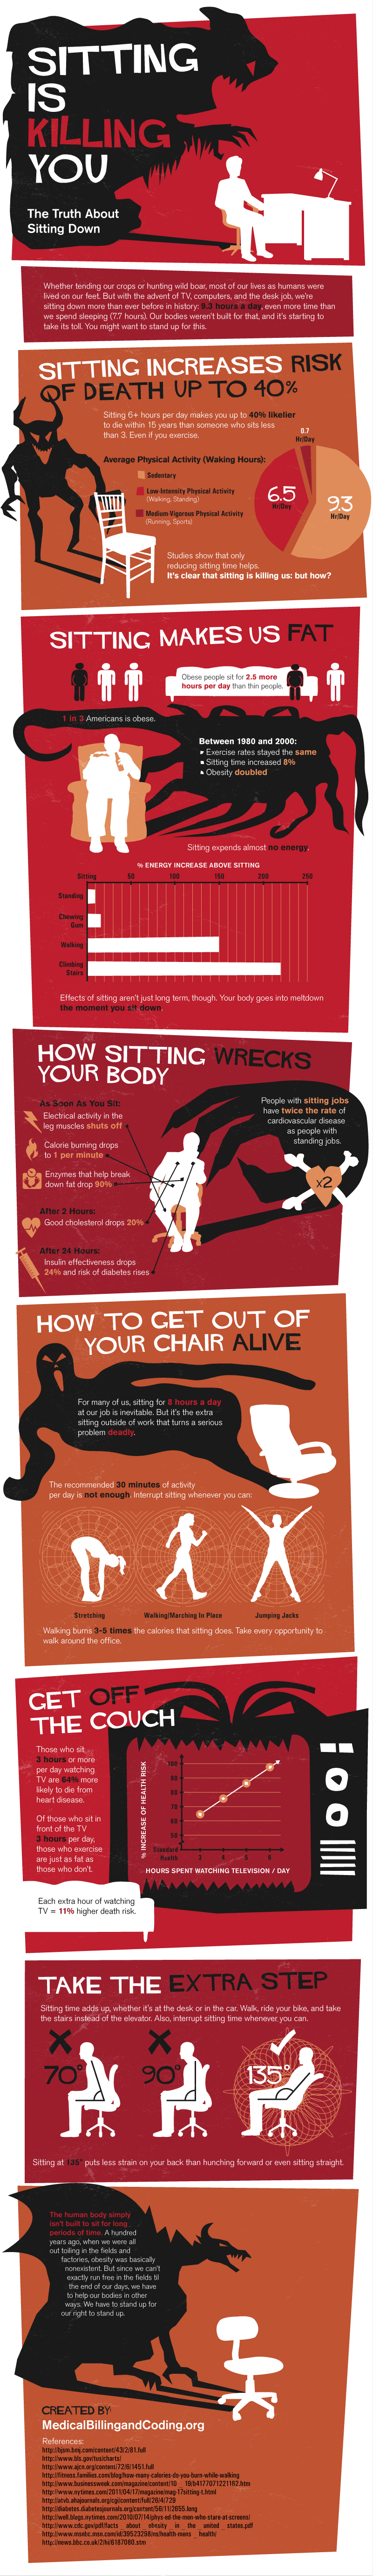 Sitting in killing you